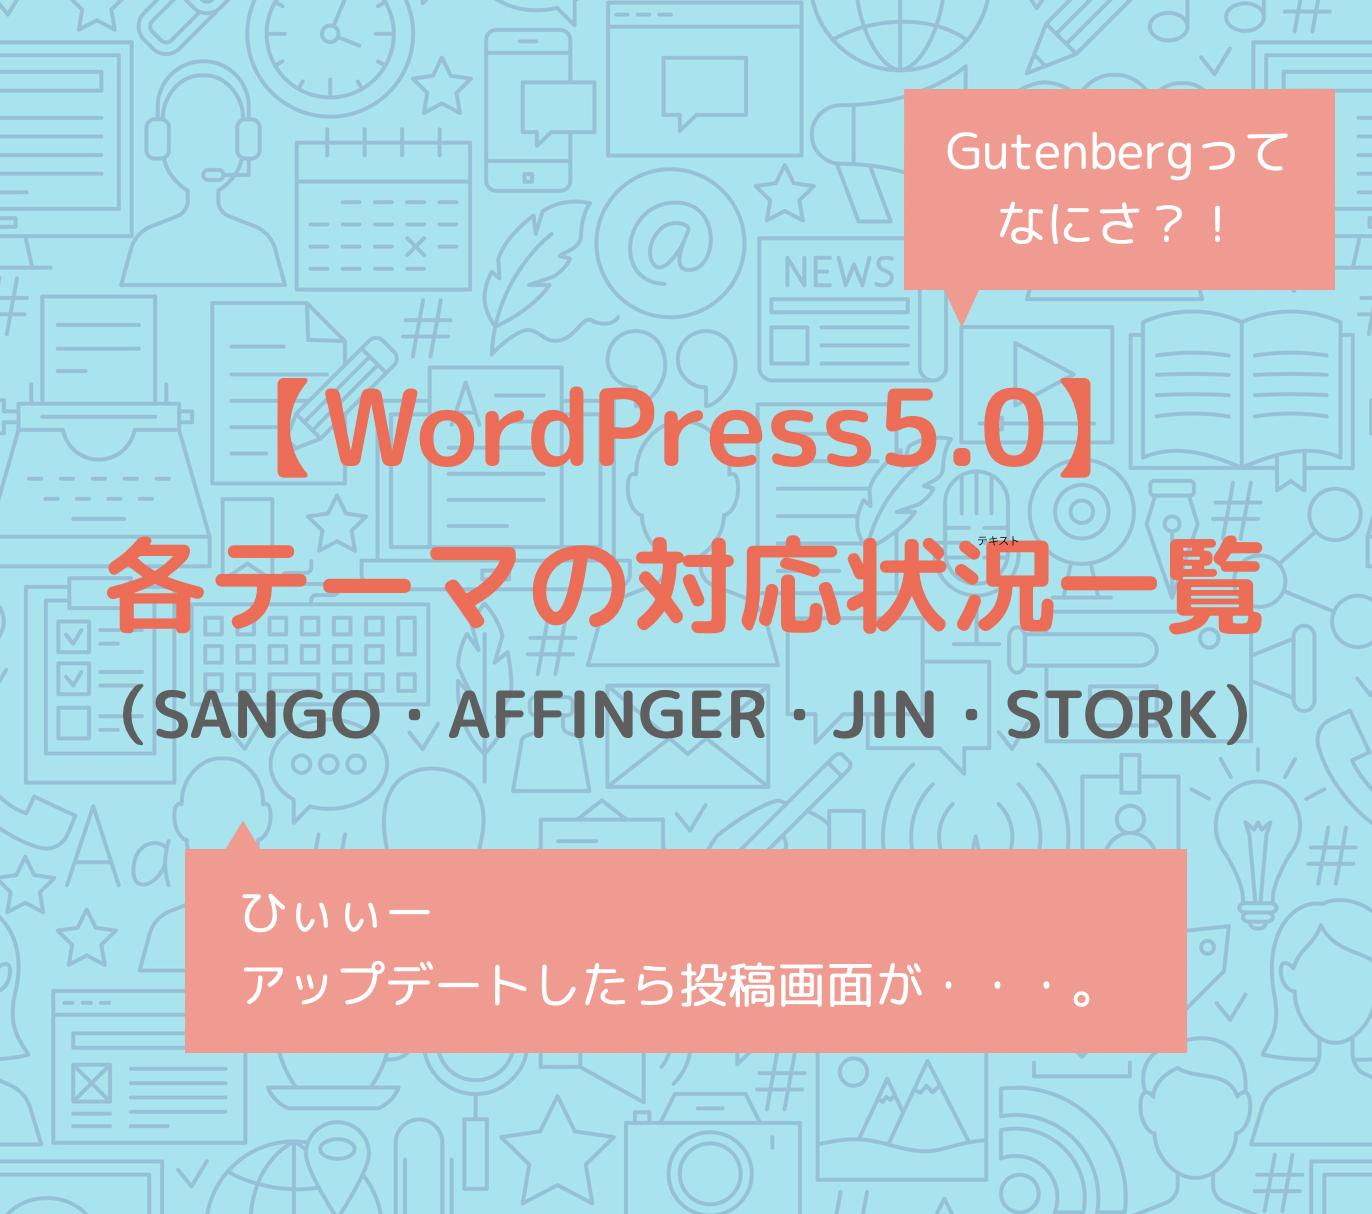 【WordPress5.0】各テーマの対応状況一覧(SANGO・AFFINGER・JIN・STORK)